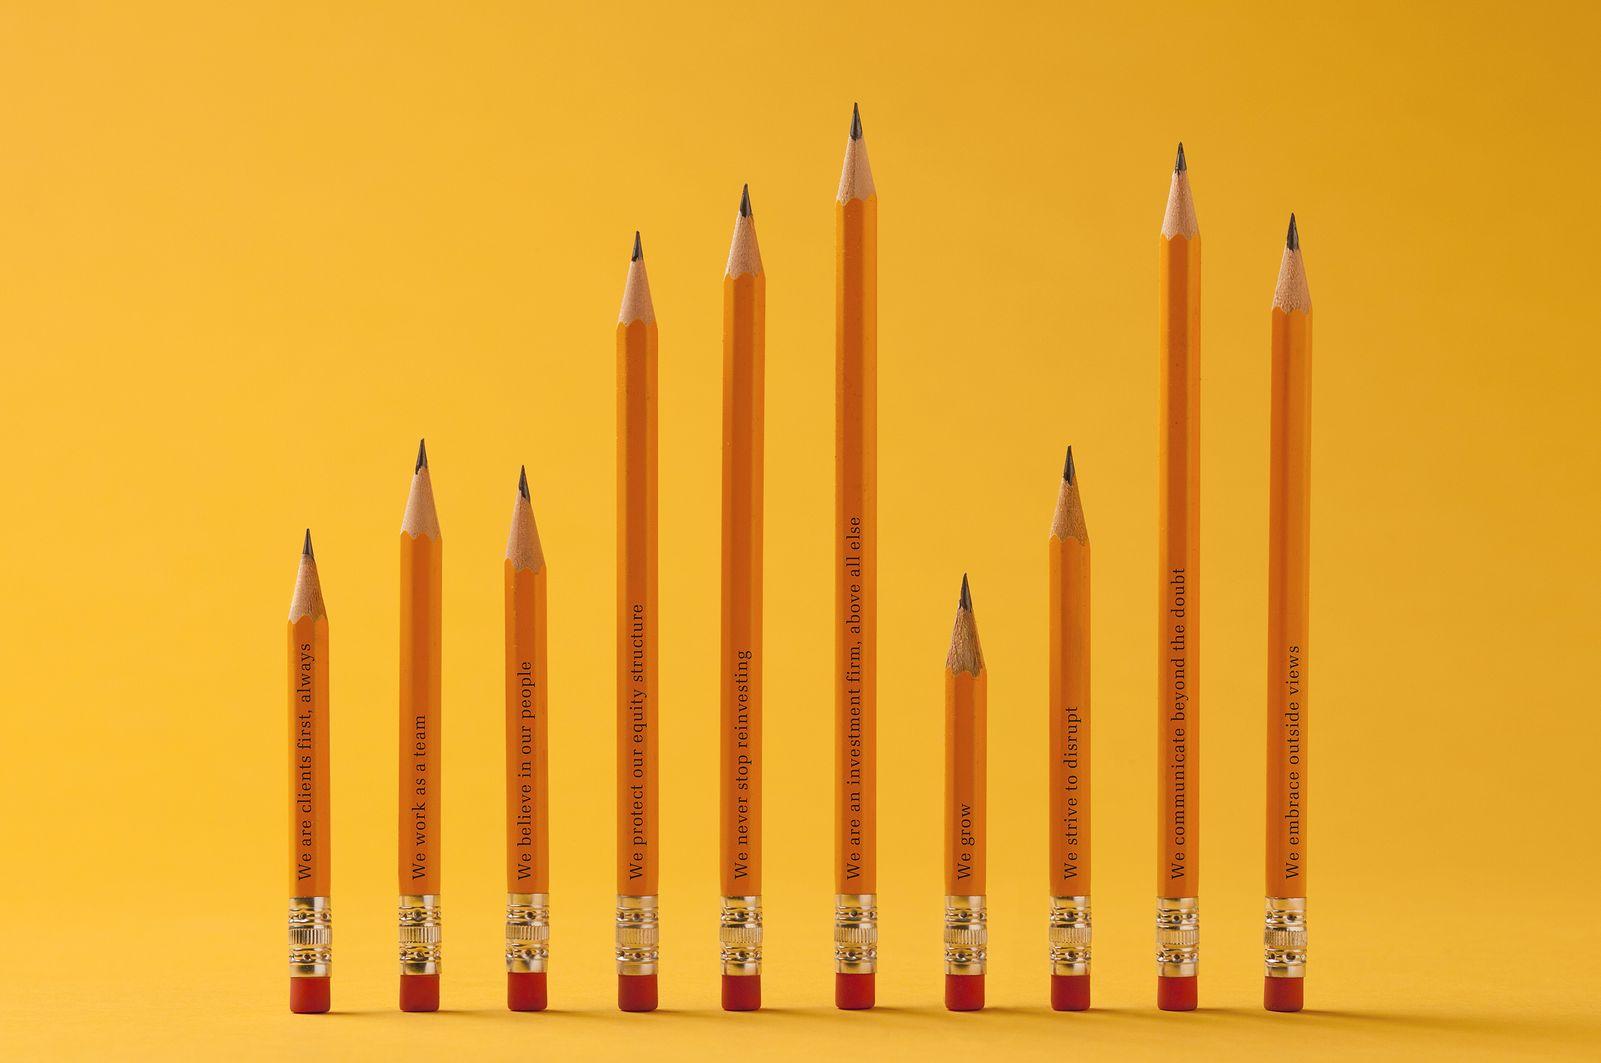 Pencils_planit_lb.jpg